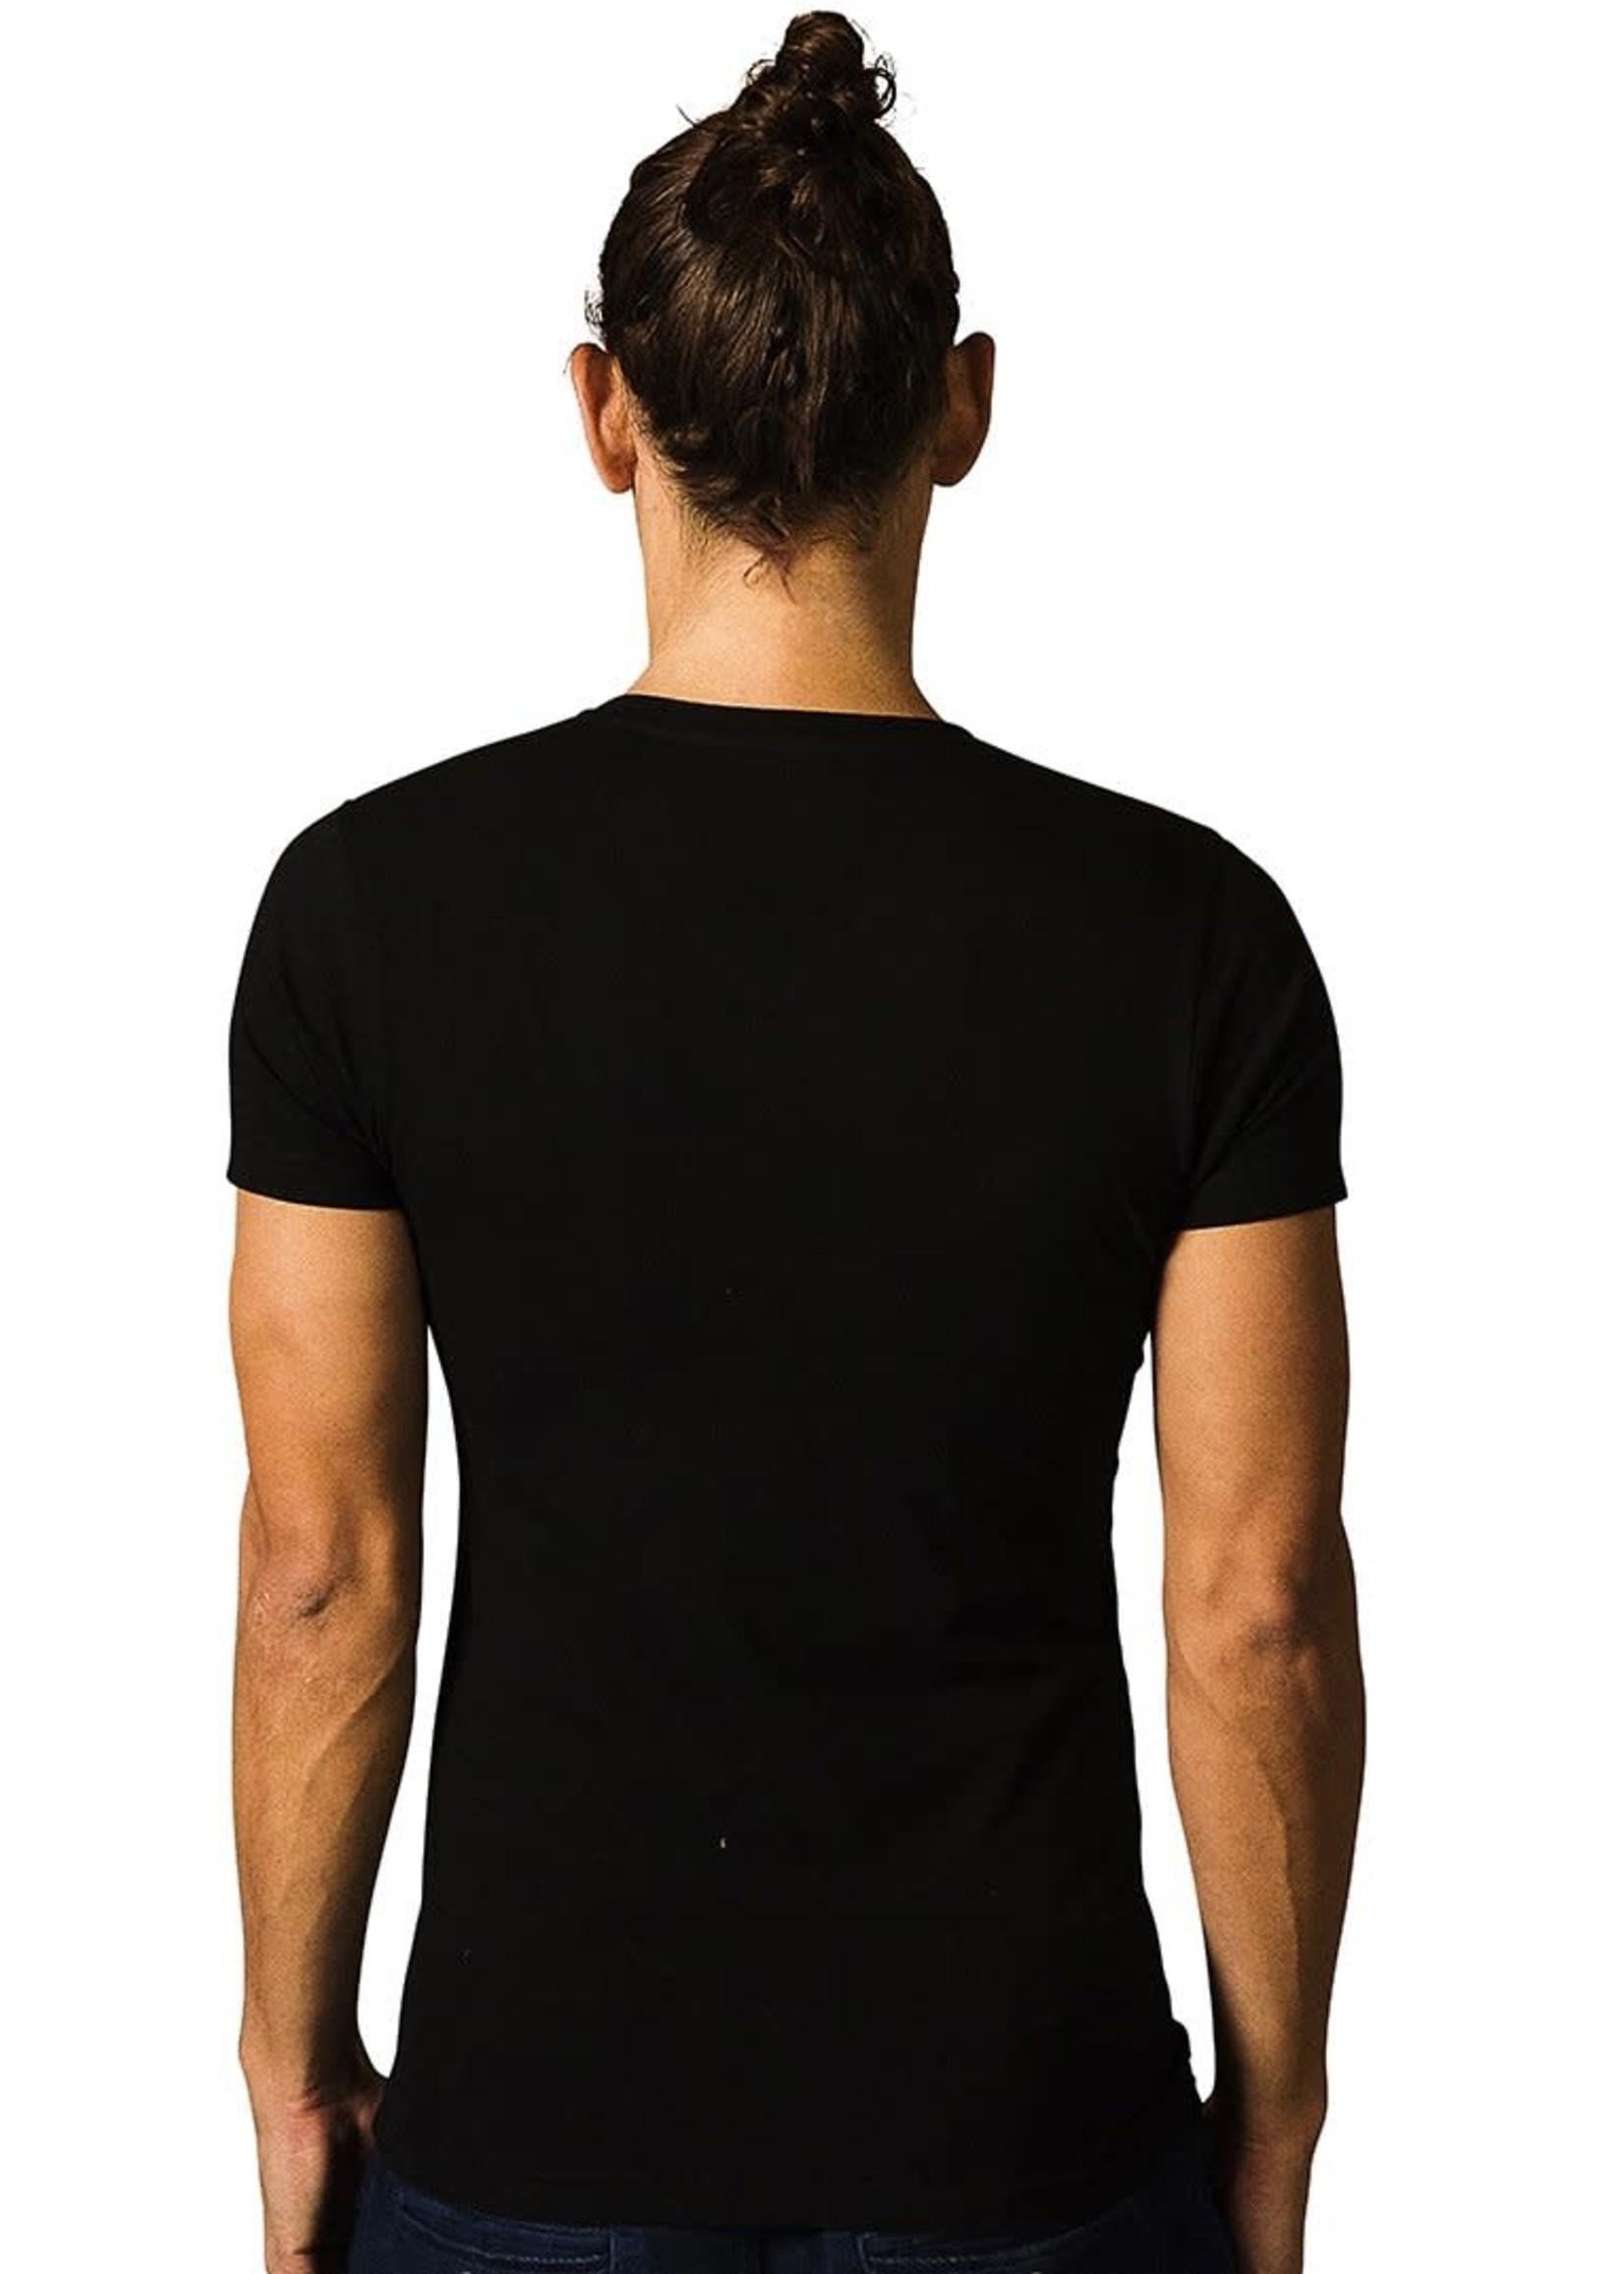 The Driftwood Tales The Driftwood Tales - T-shirt Basic - Biologisch katoen - zwart - V - hals